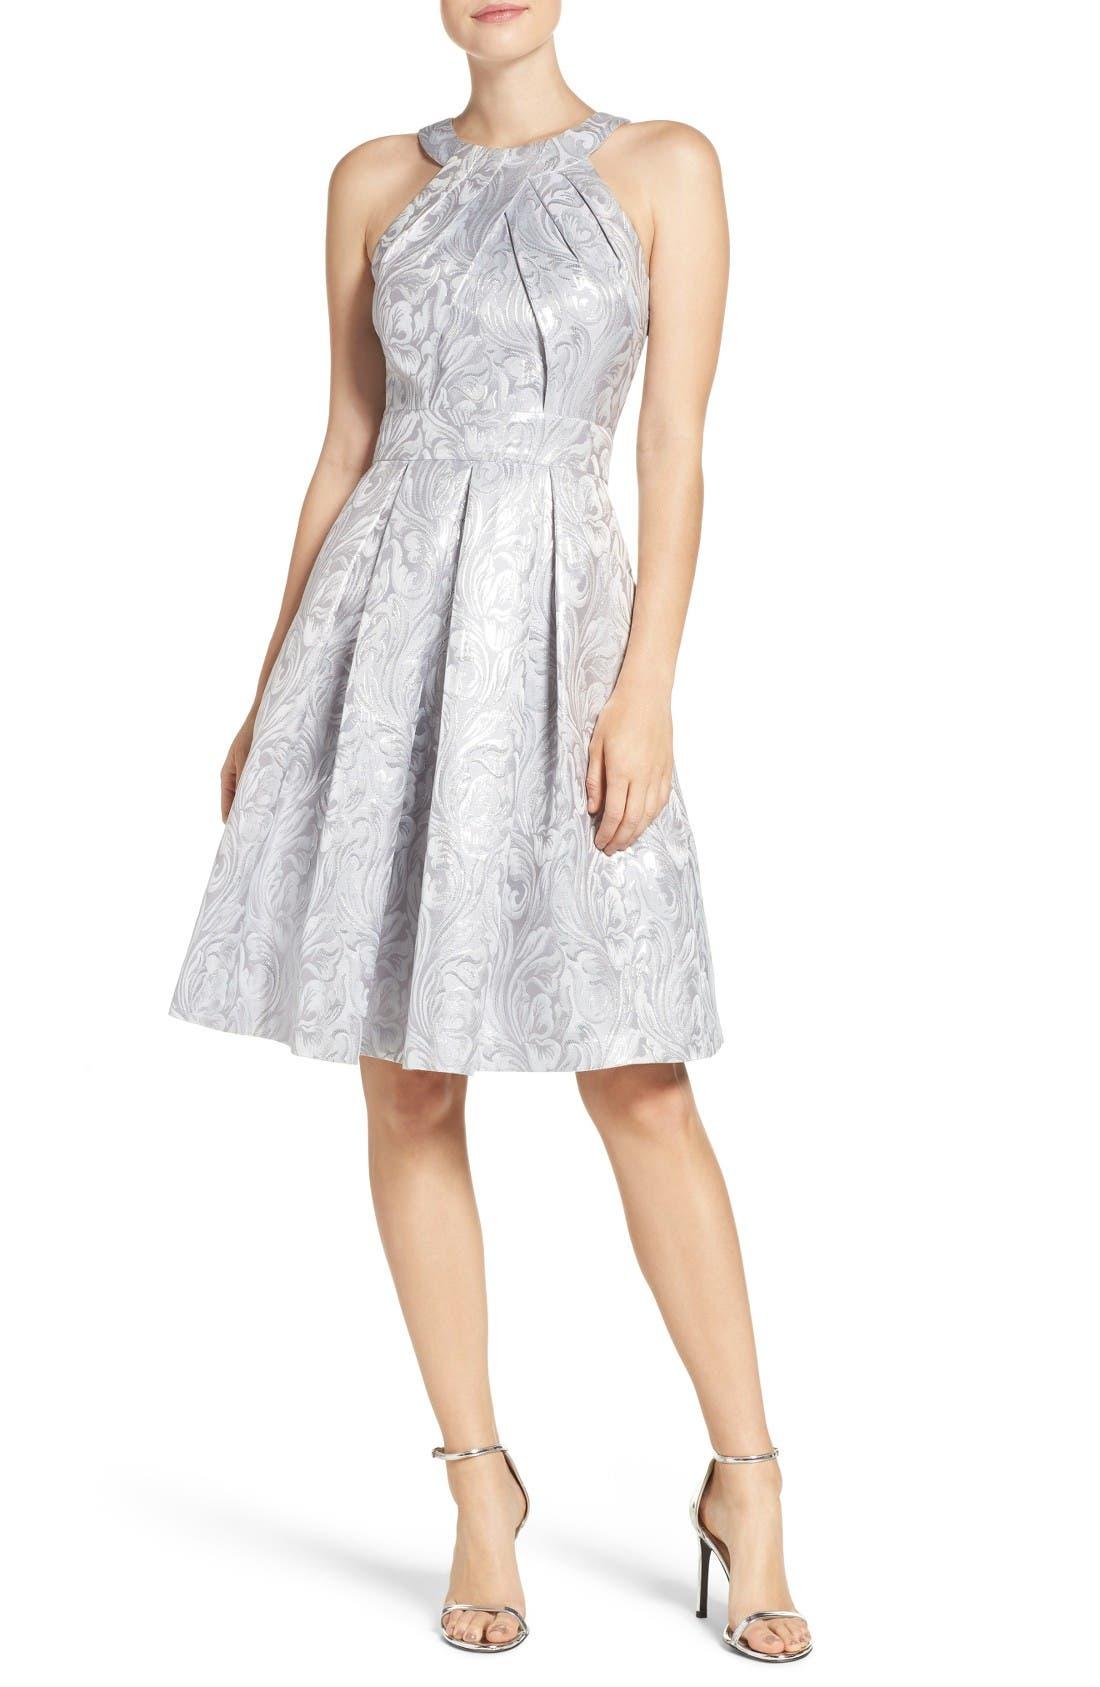 Alternate Image 1 Selected - Eliza J Jacquard Fit & Flare Dress